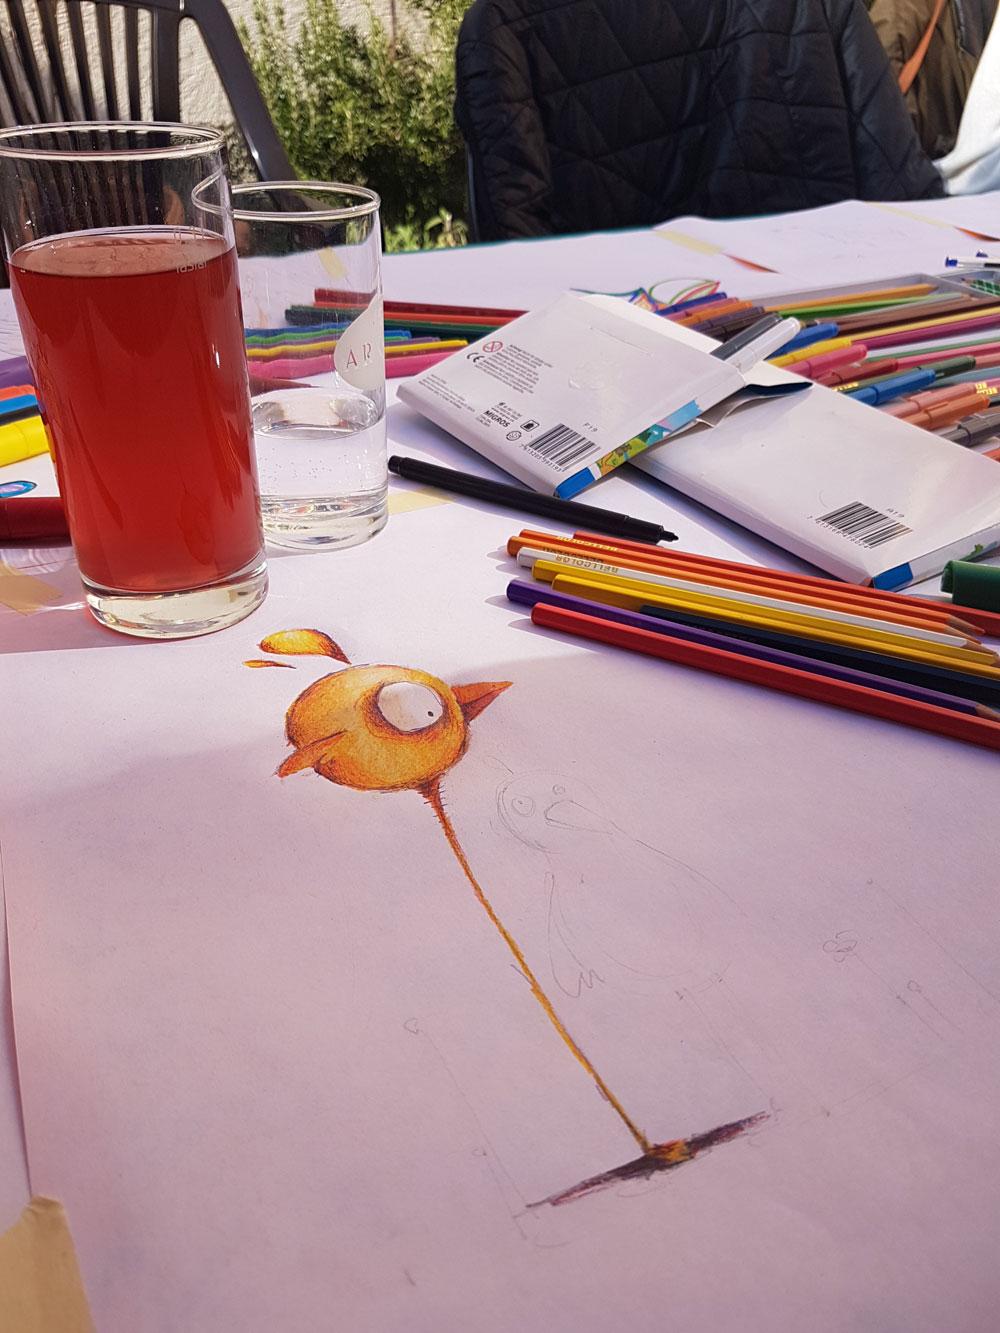 Marcelle-collectif-les-oiseaux-drink-n-draw_12.jpg